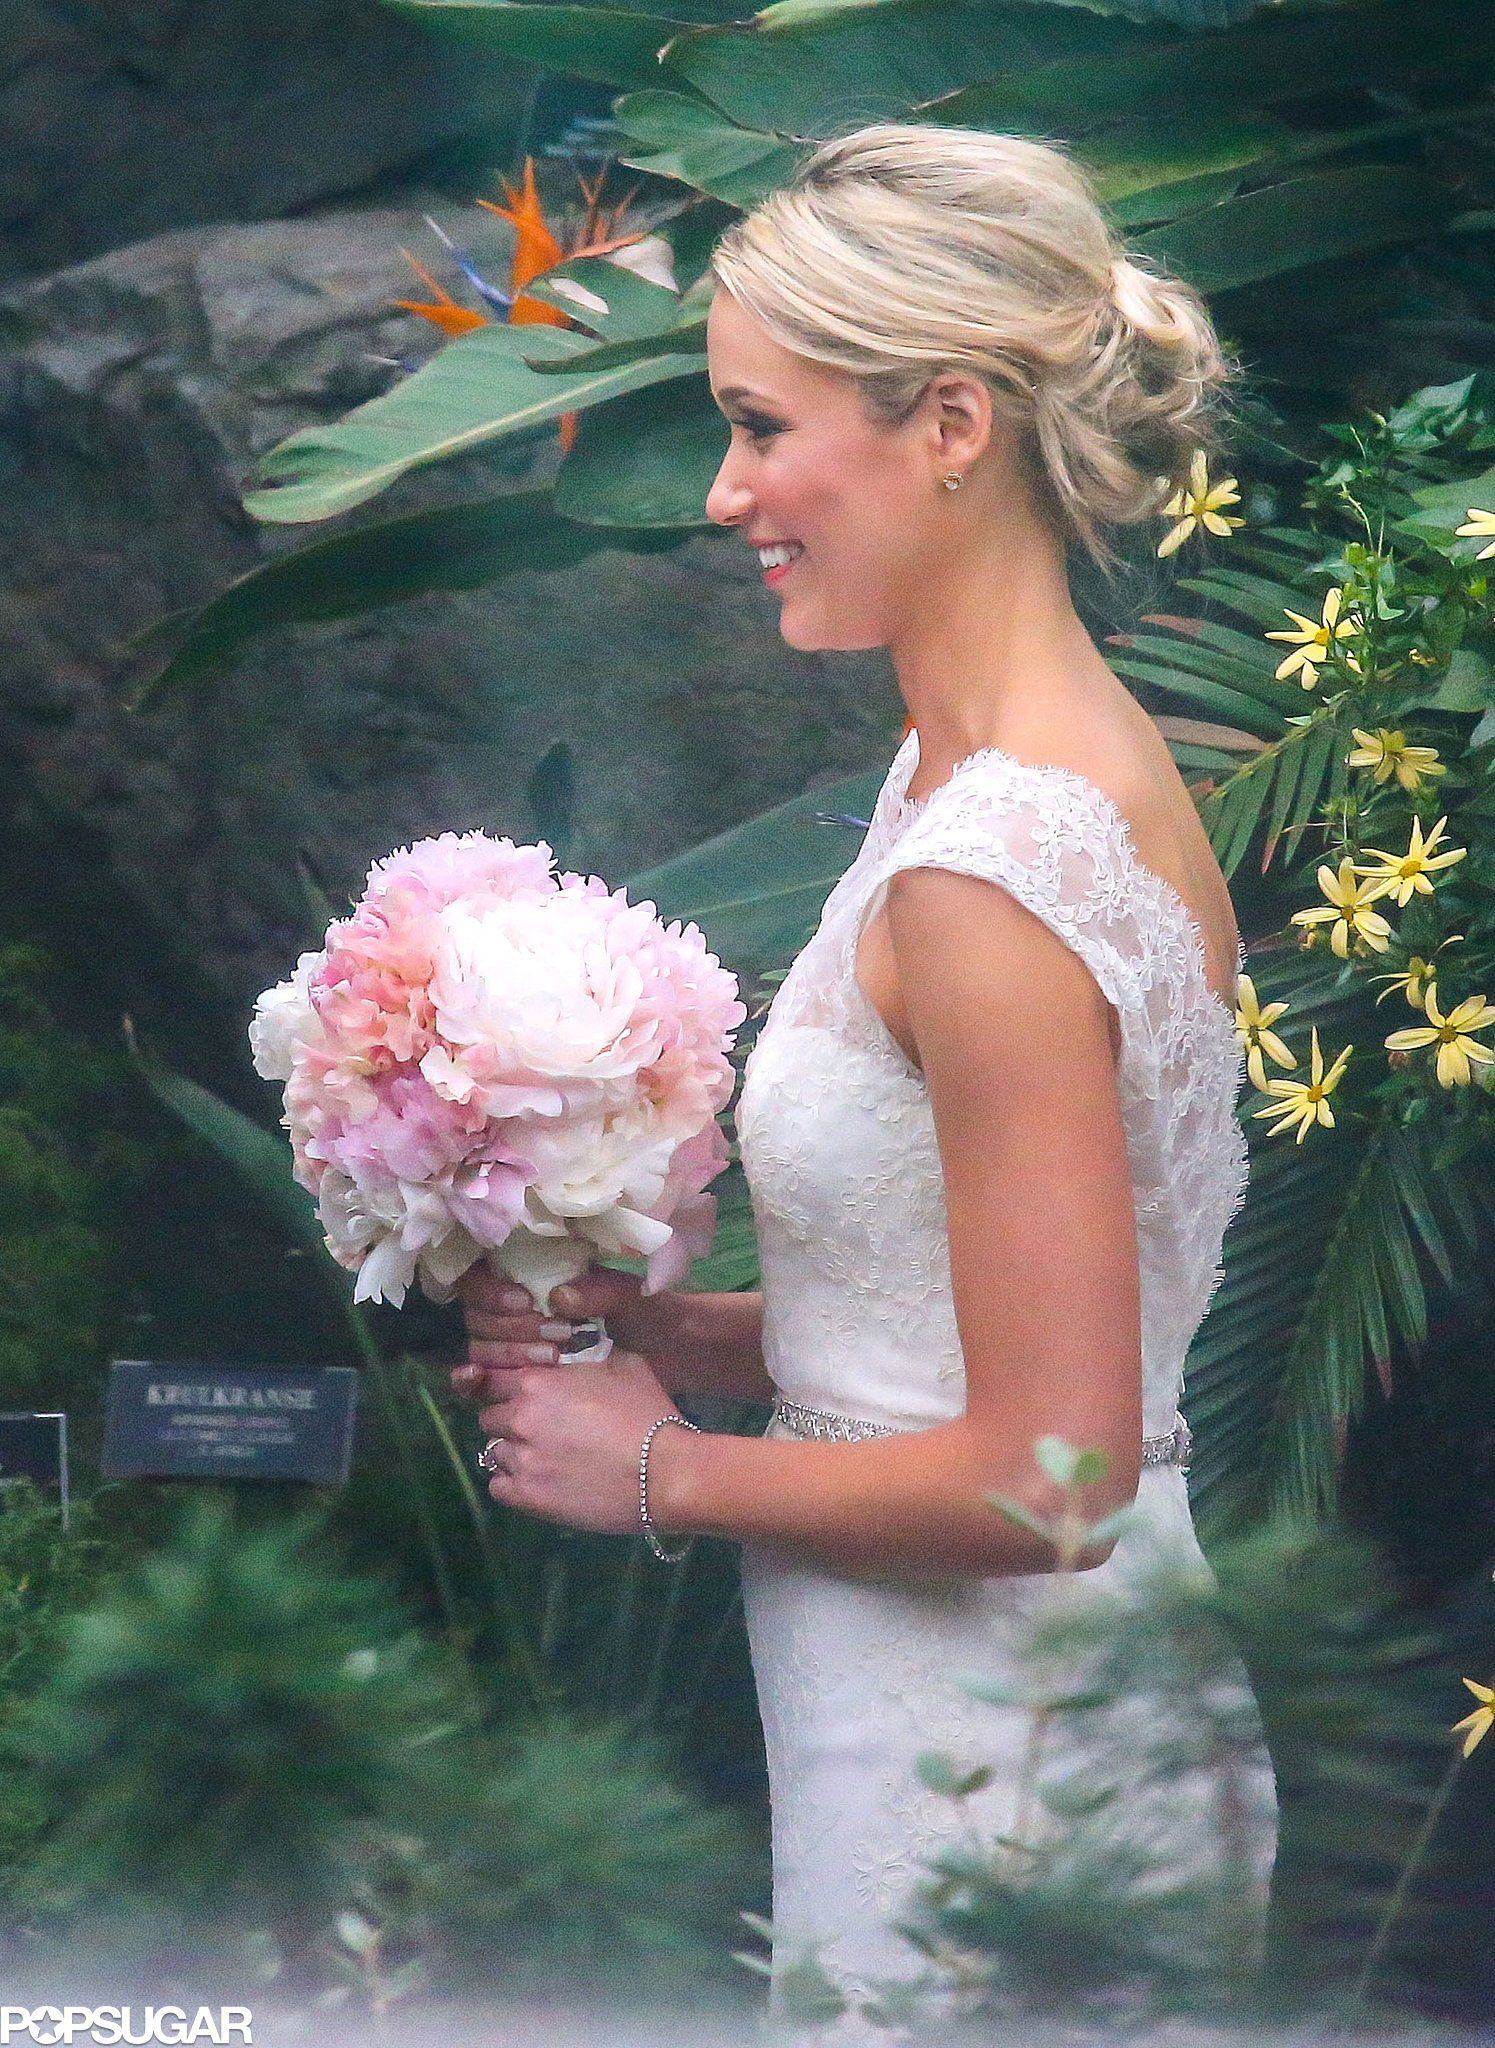 30 Rock's Katrina Bowden married Ben Jorgensen in Brooklyn.